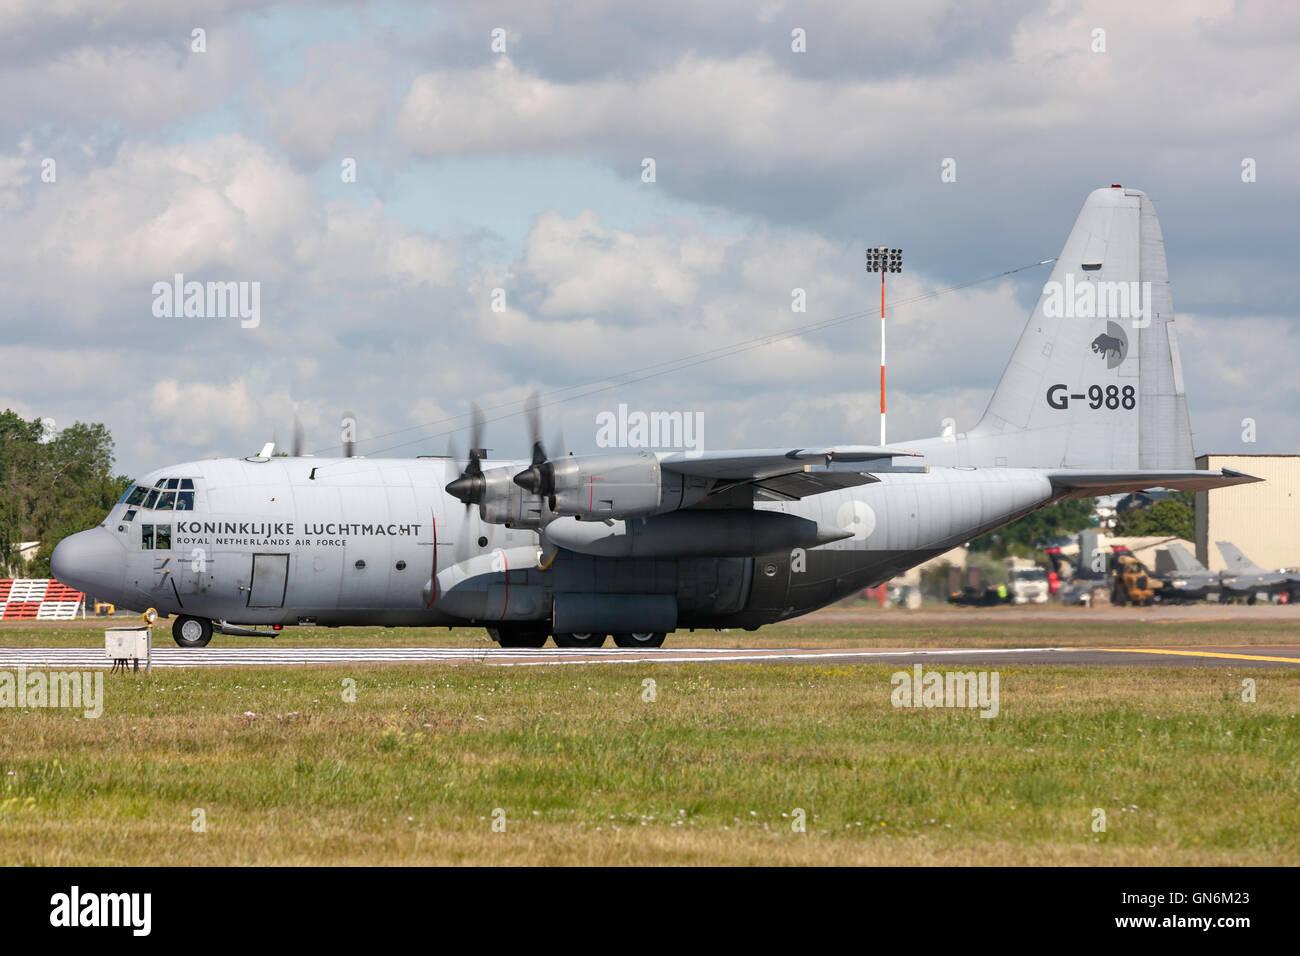 Royal Netherlands Air Force (Koninklijke Luchtmacht) (RNLAF) Lockheed C-130H Hercules military transport aircraft - Stock Image